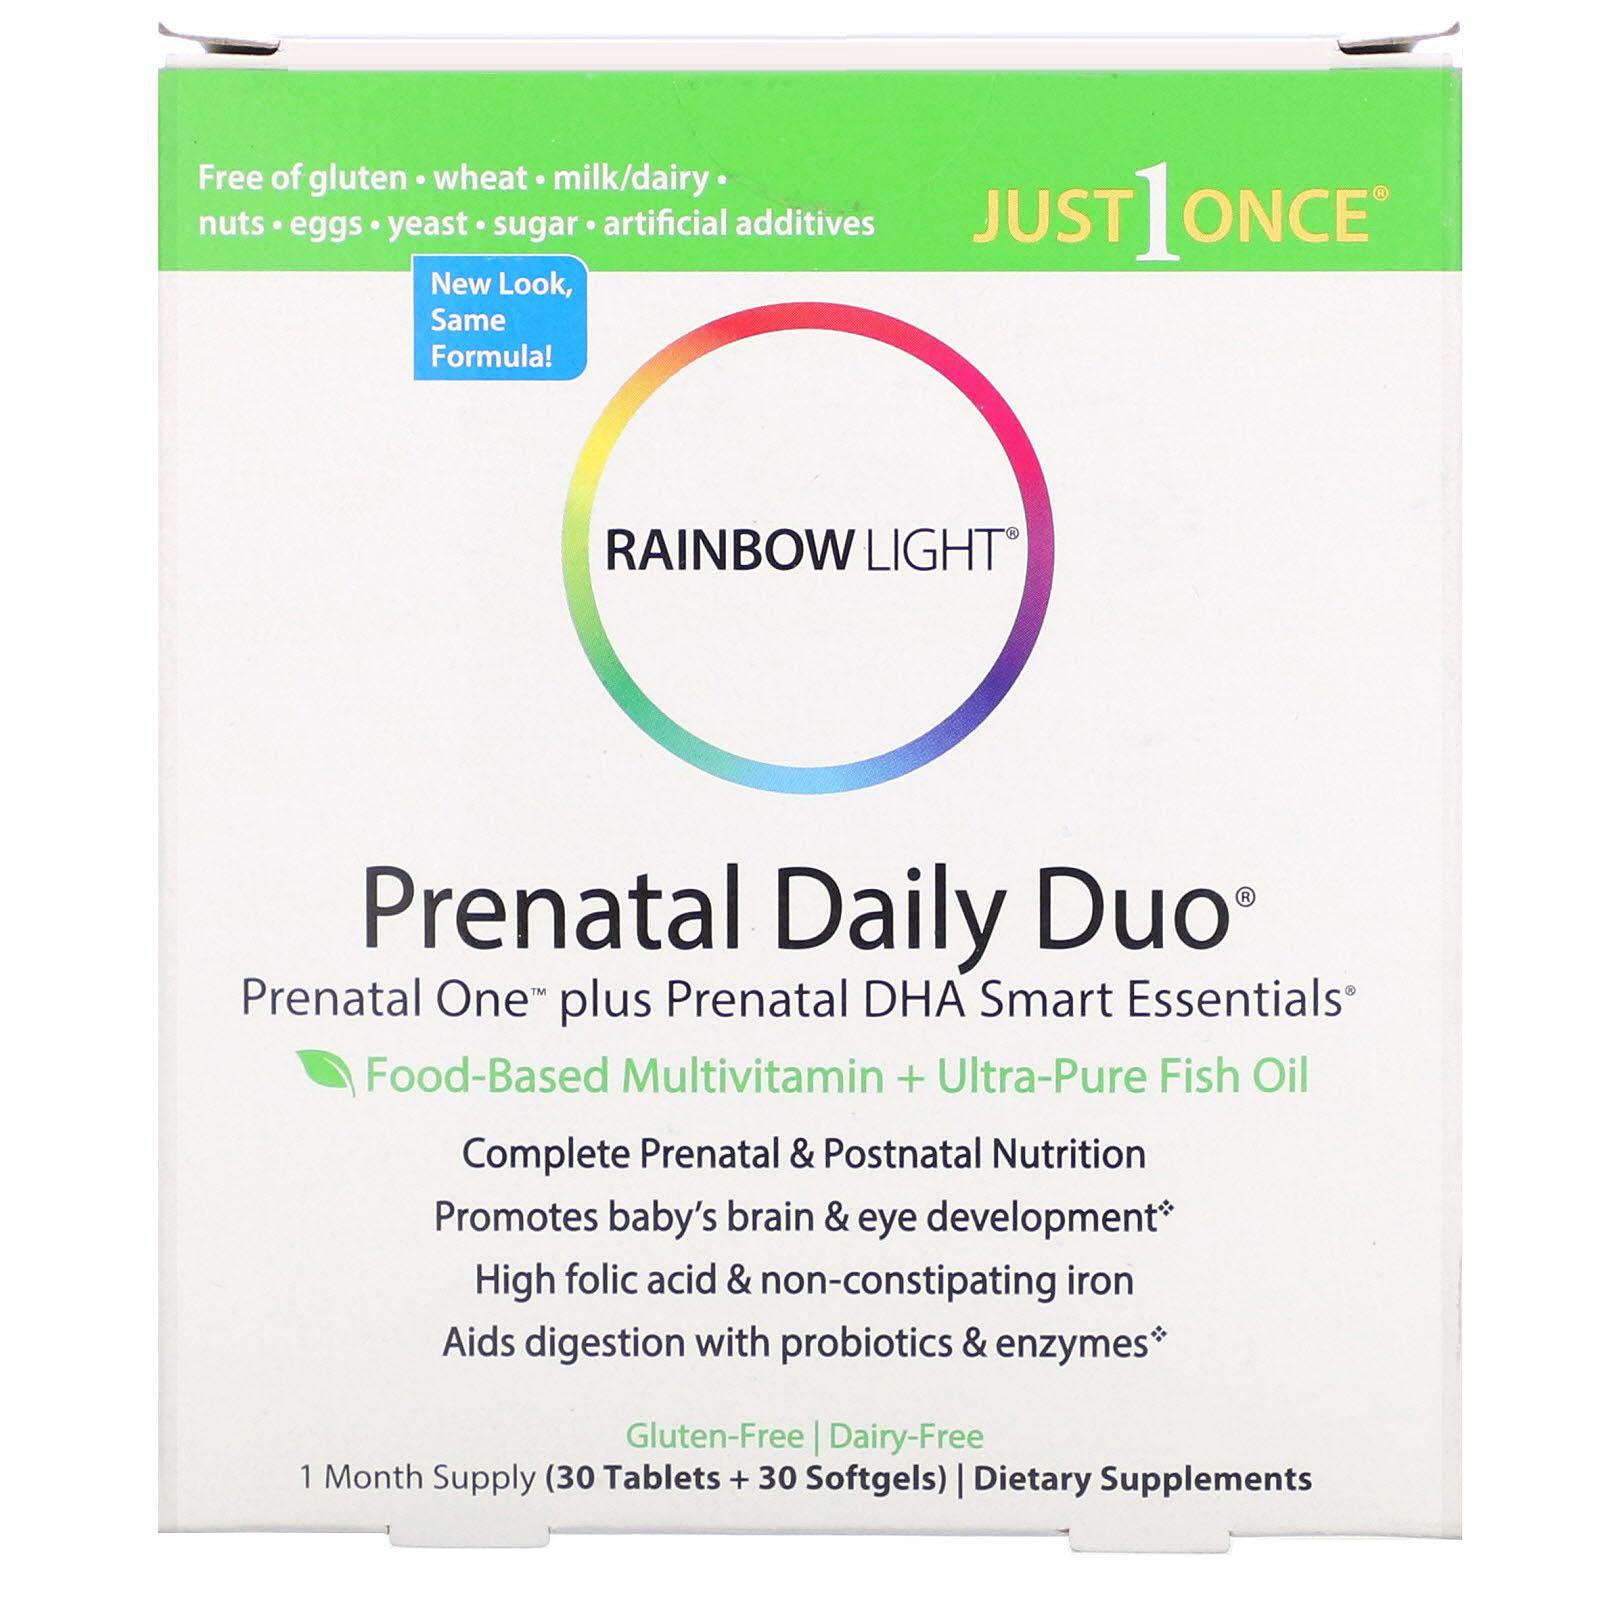 Rainbow Light, Prenatal Daily Duo, Prenatal One plus Prenatal DHA Smart Essentials, 1 Month Supply (30 Tablets + 30 Softgels)